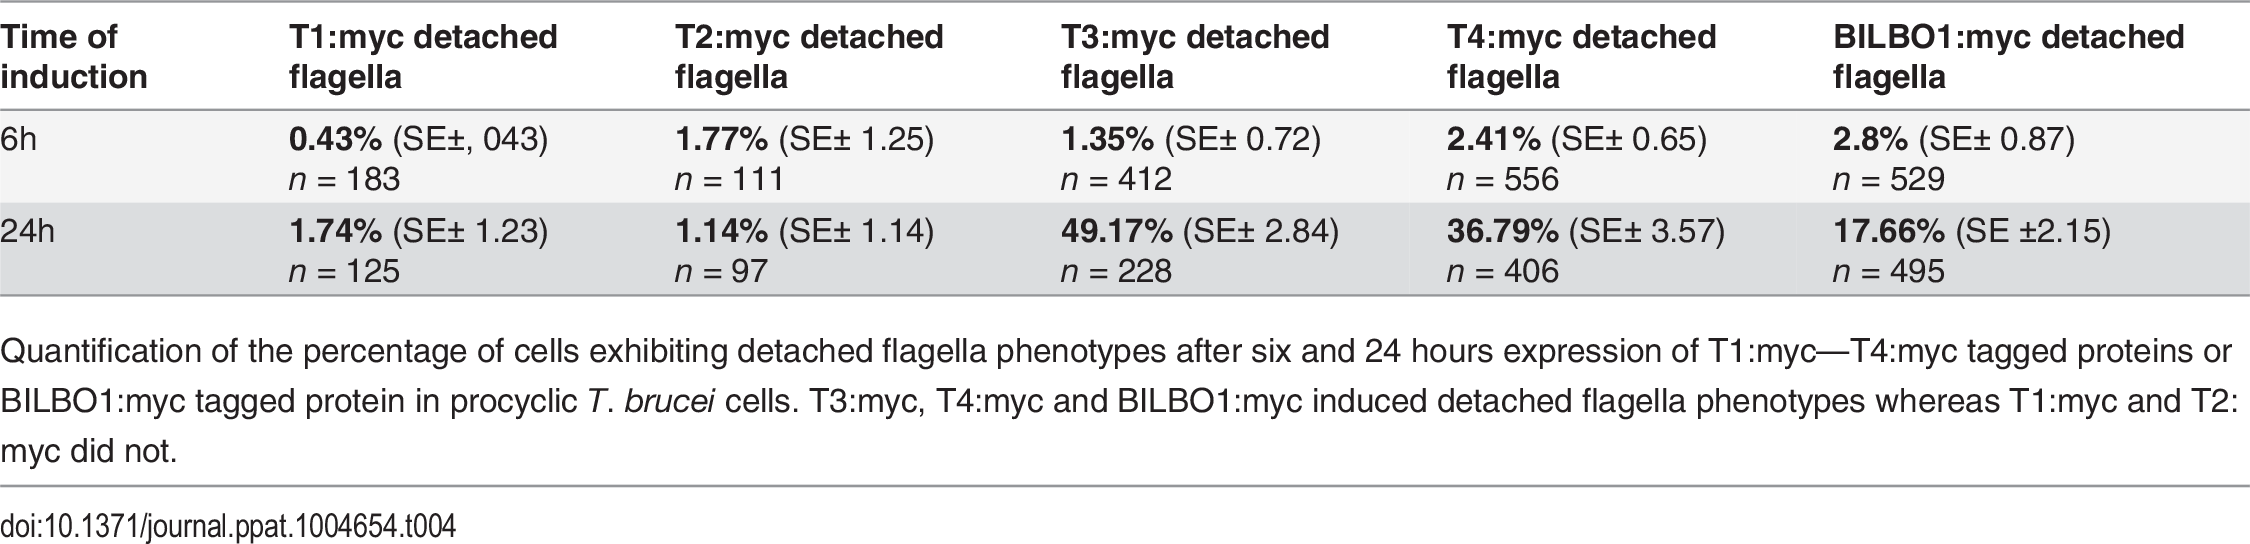 T1:myc—T4:myc and BILBO1:myc detached flagellum phenotypes after expression <i>T. brucei</i> cells.